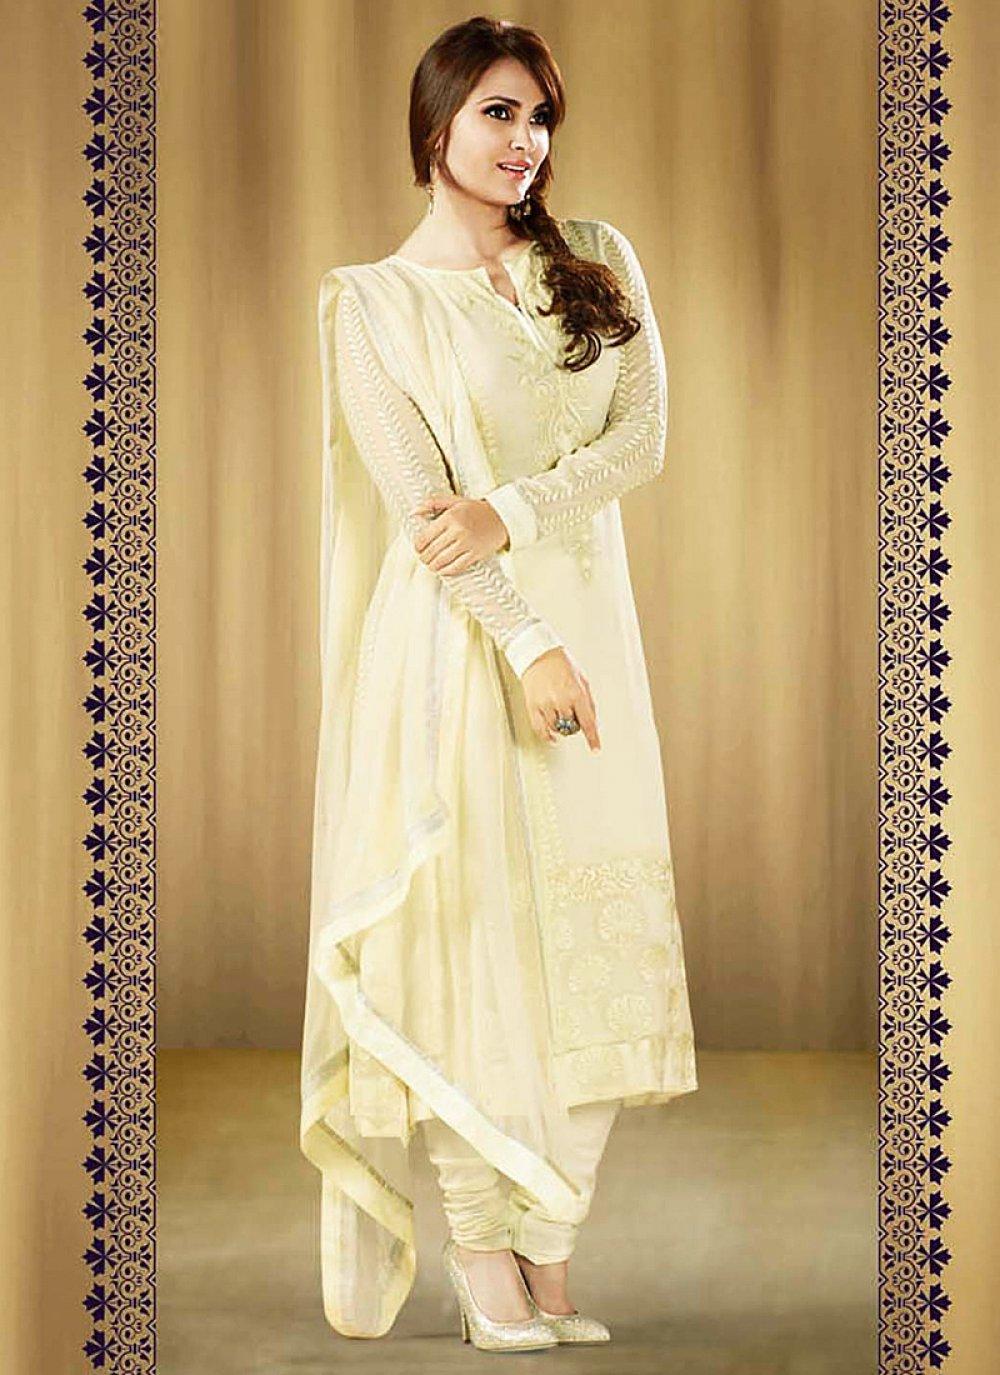 Lara Dutta Cream Resham Work Anarkali Salwar Kameez